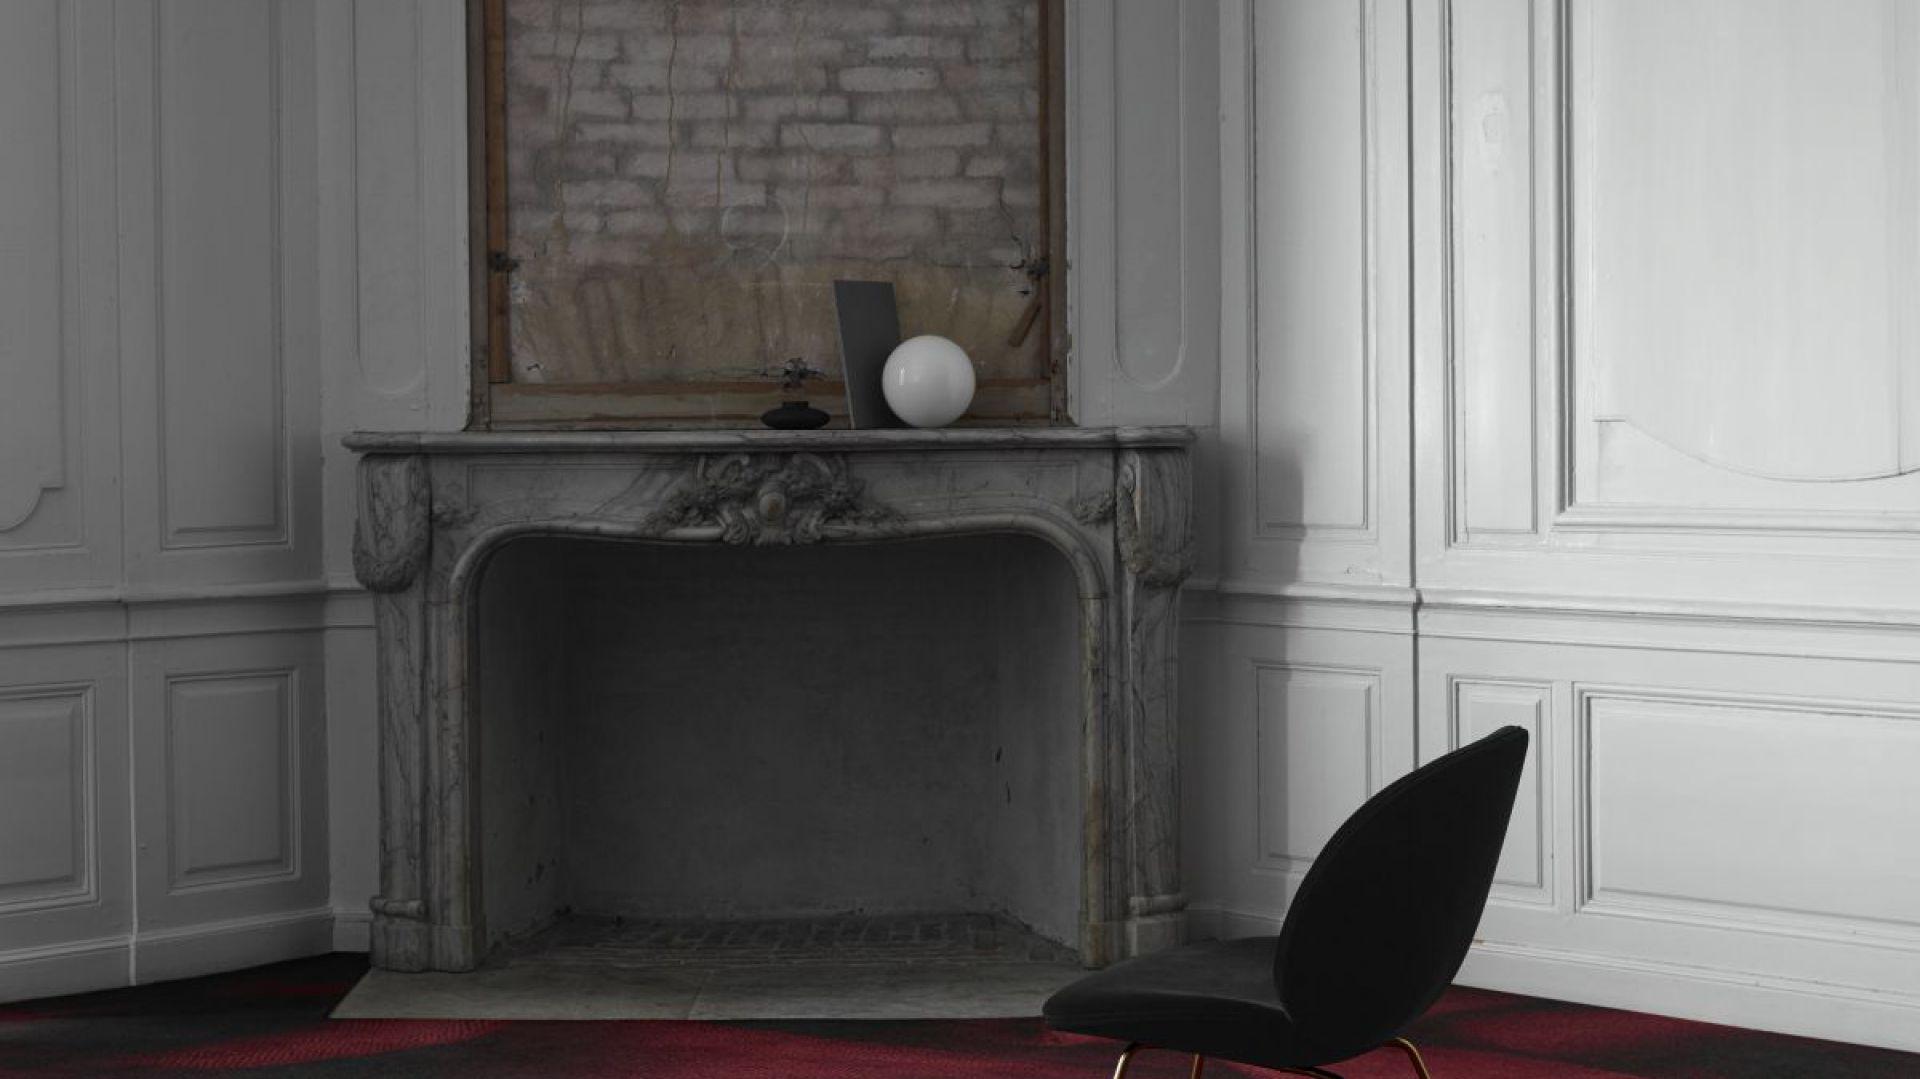 e01c7e14fb Barwne dywany. Nowa kolekcja od Monsieur Christian Lacroix. Fot. Carpet  Studio